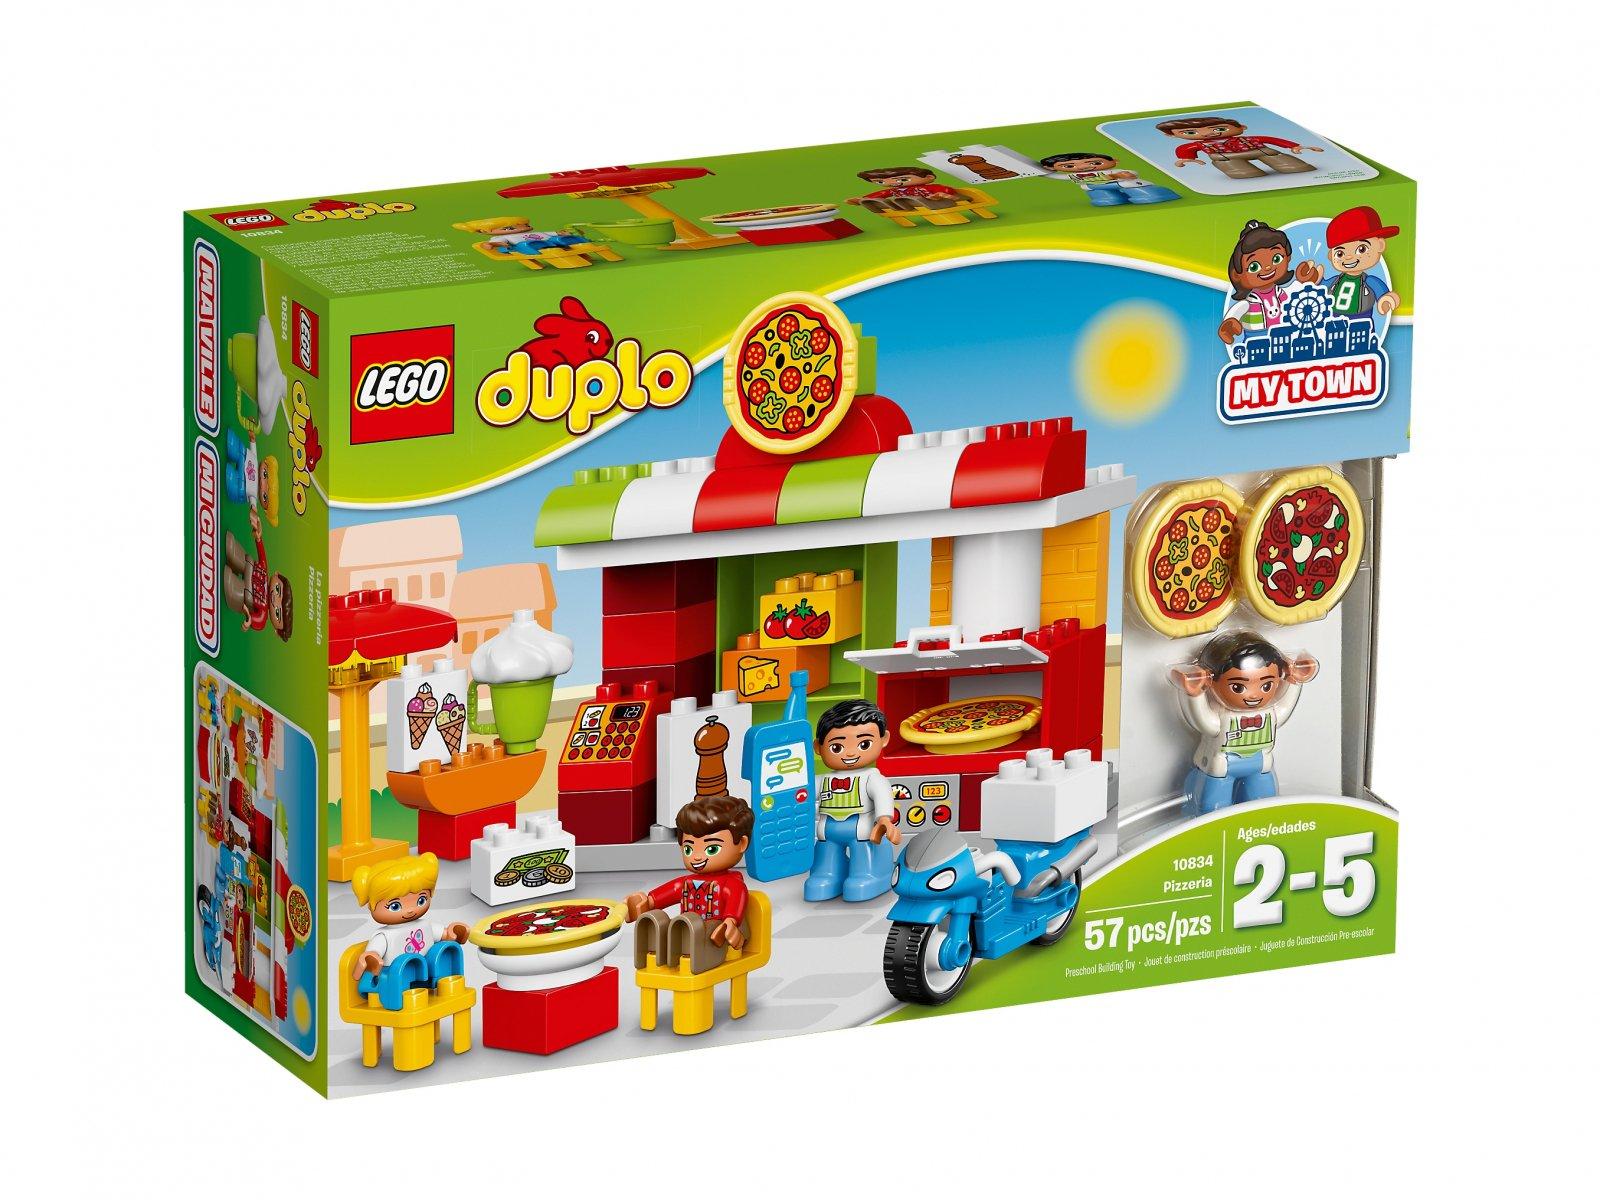 LEGO Duplo® 10834 Pizzeria